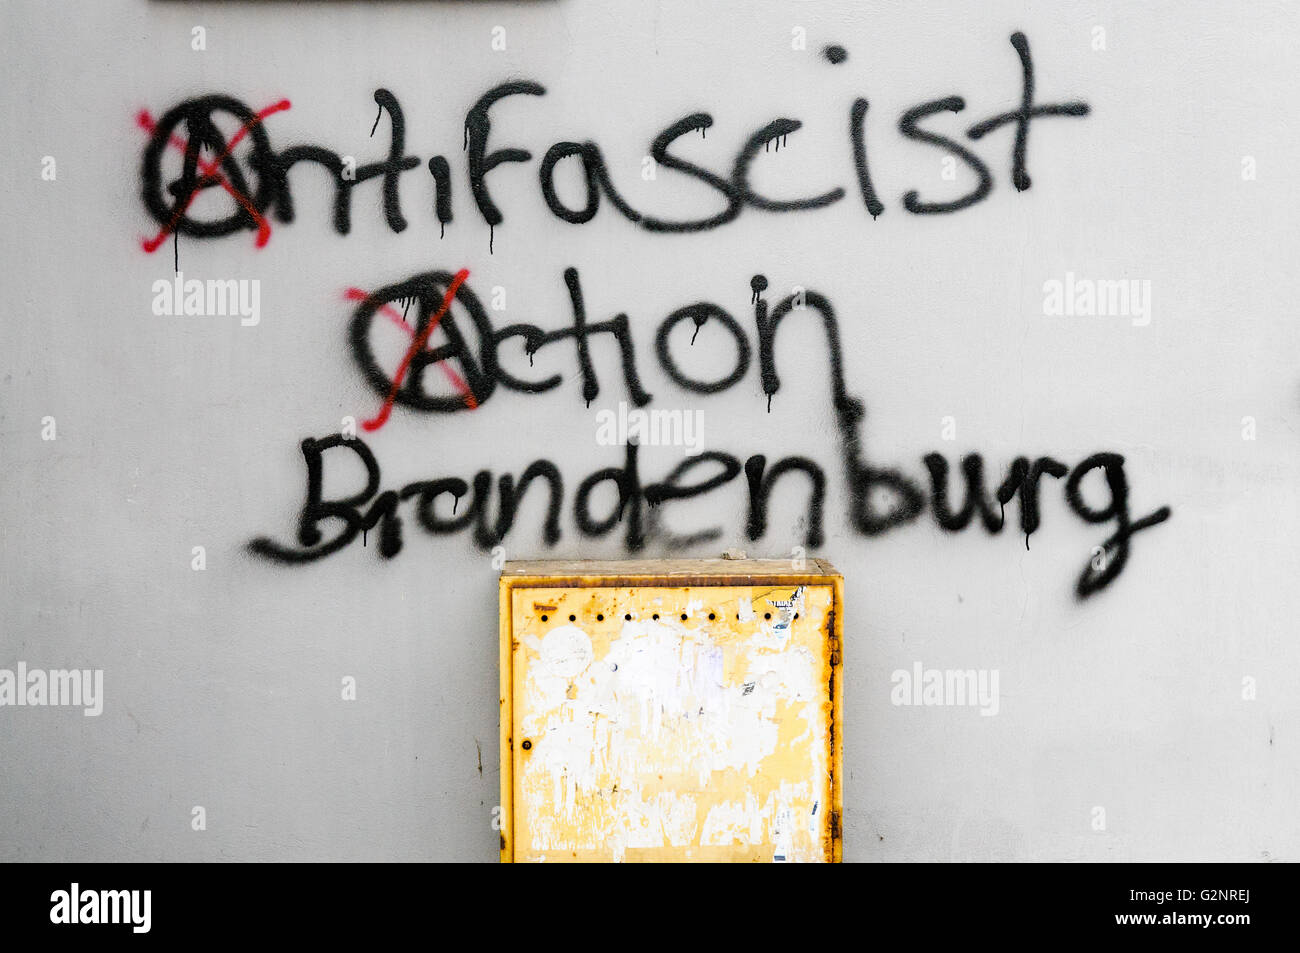 Graffiti on a wall saying 'Antifascist Action Brandenburg' - Stock Image